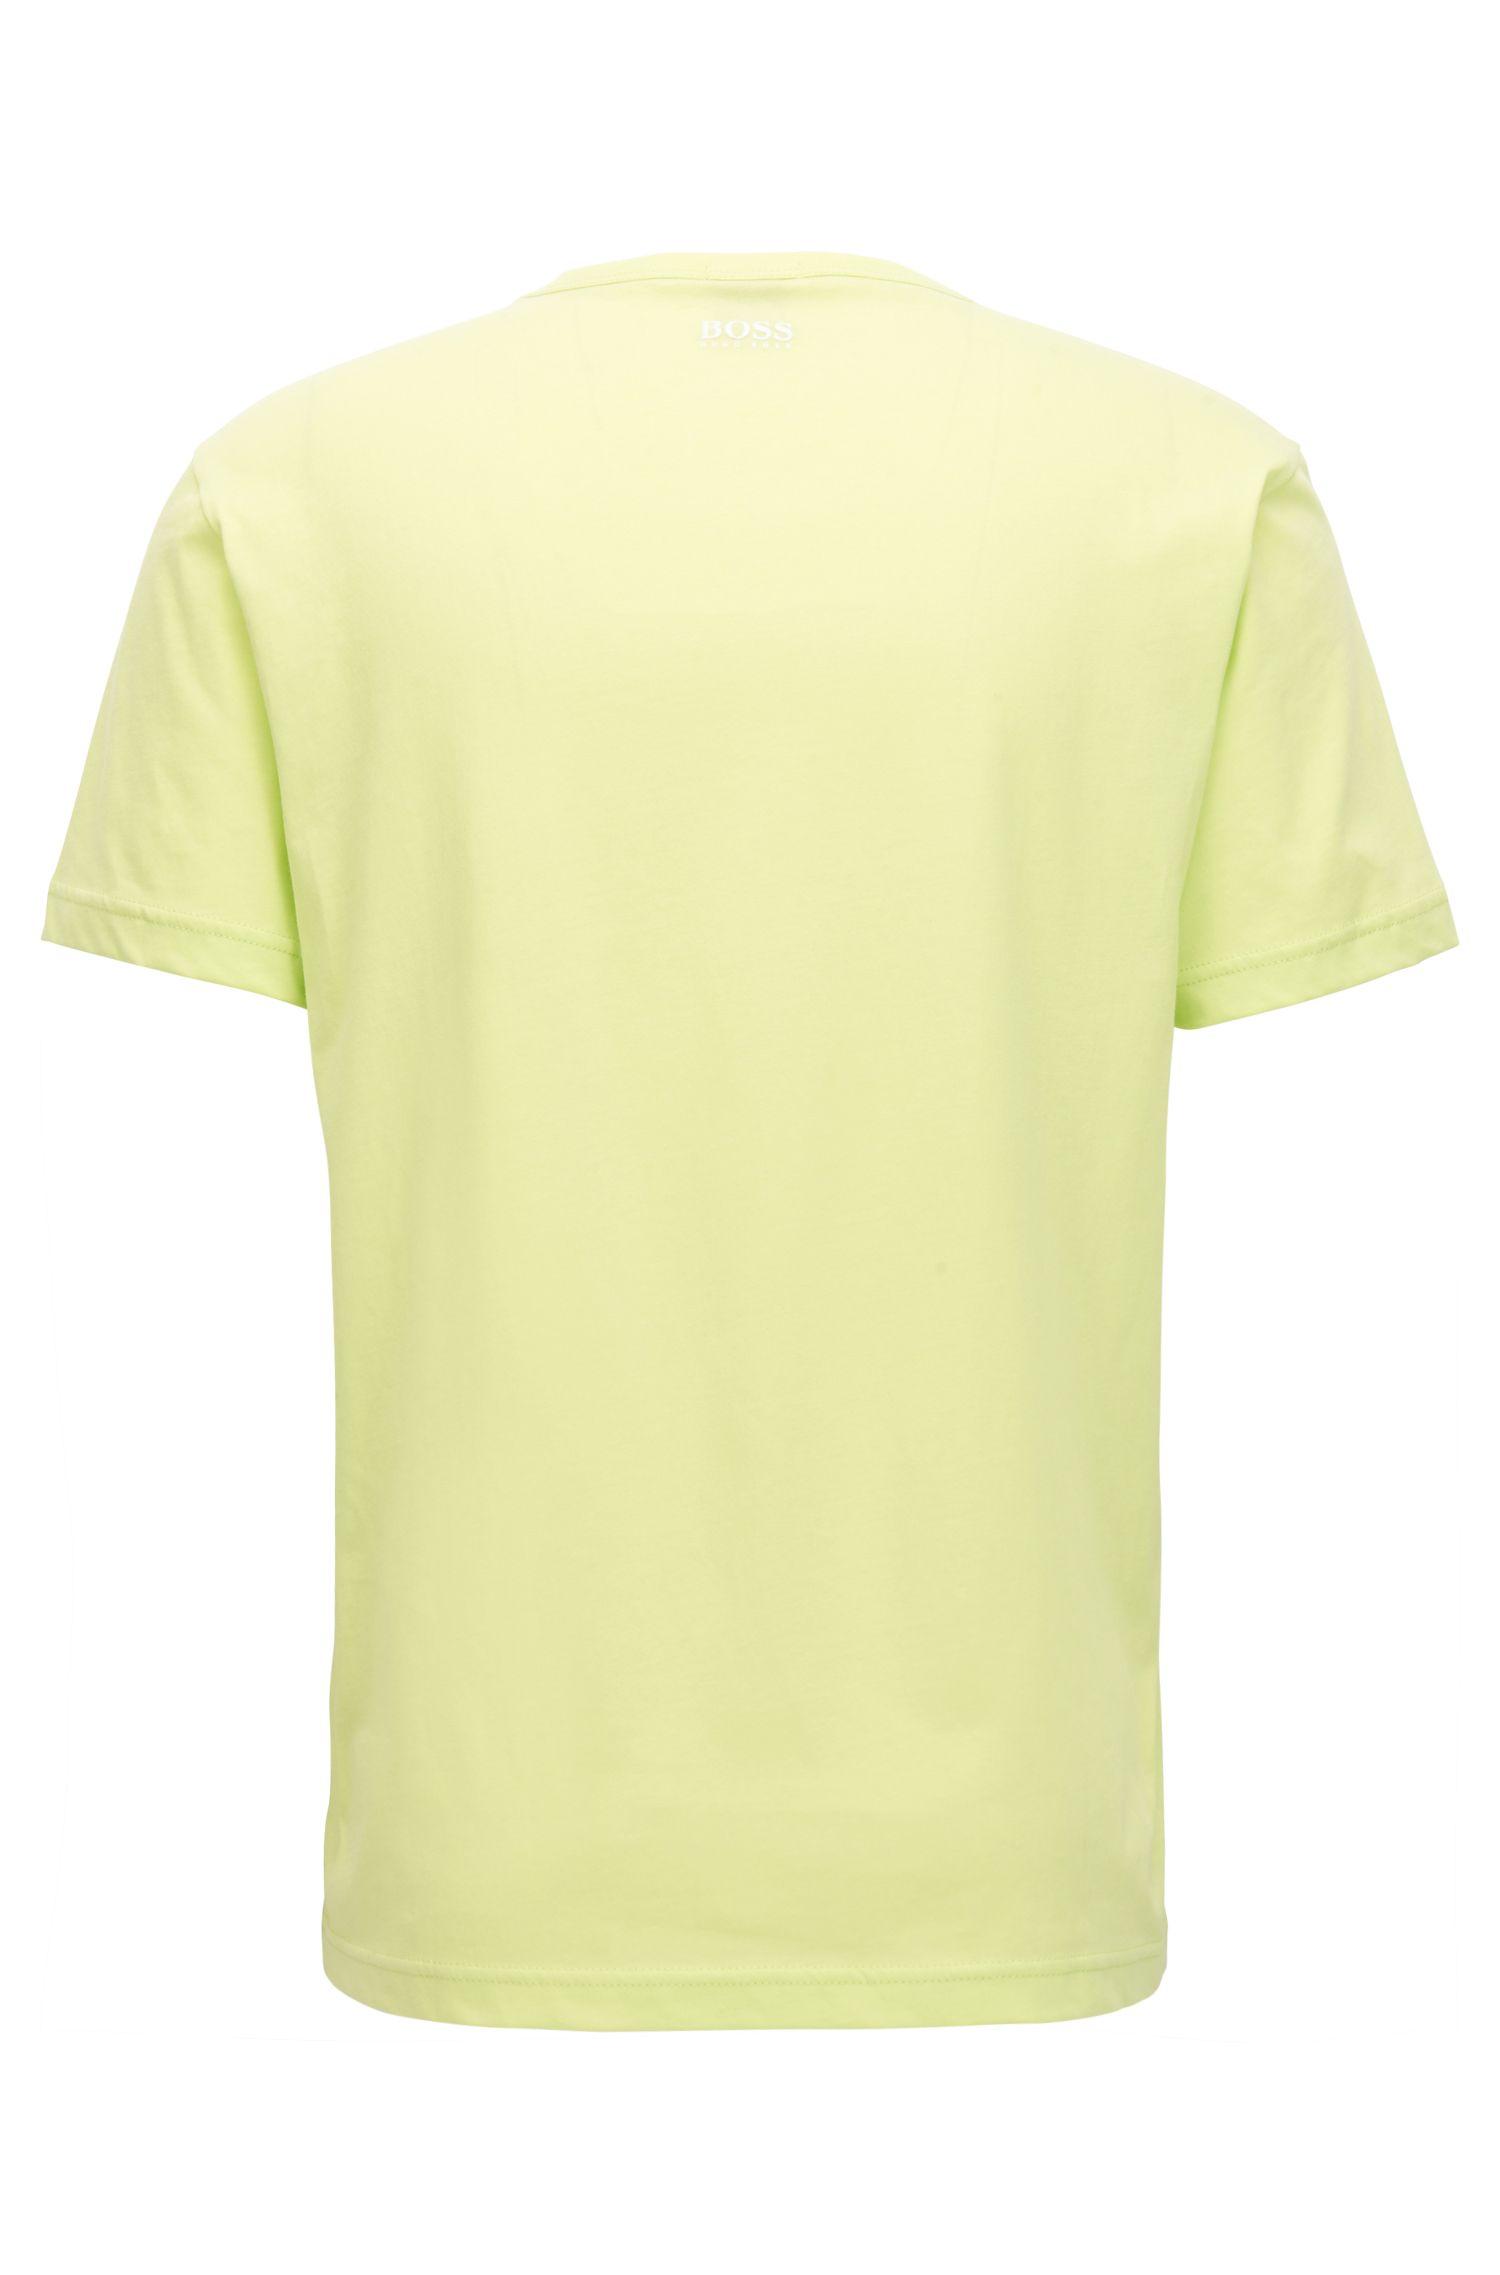 Logo Cotton Graphic T-Shirt   Tee